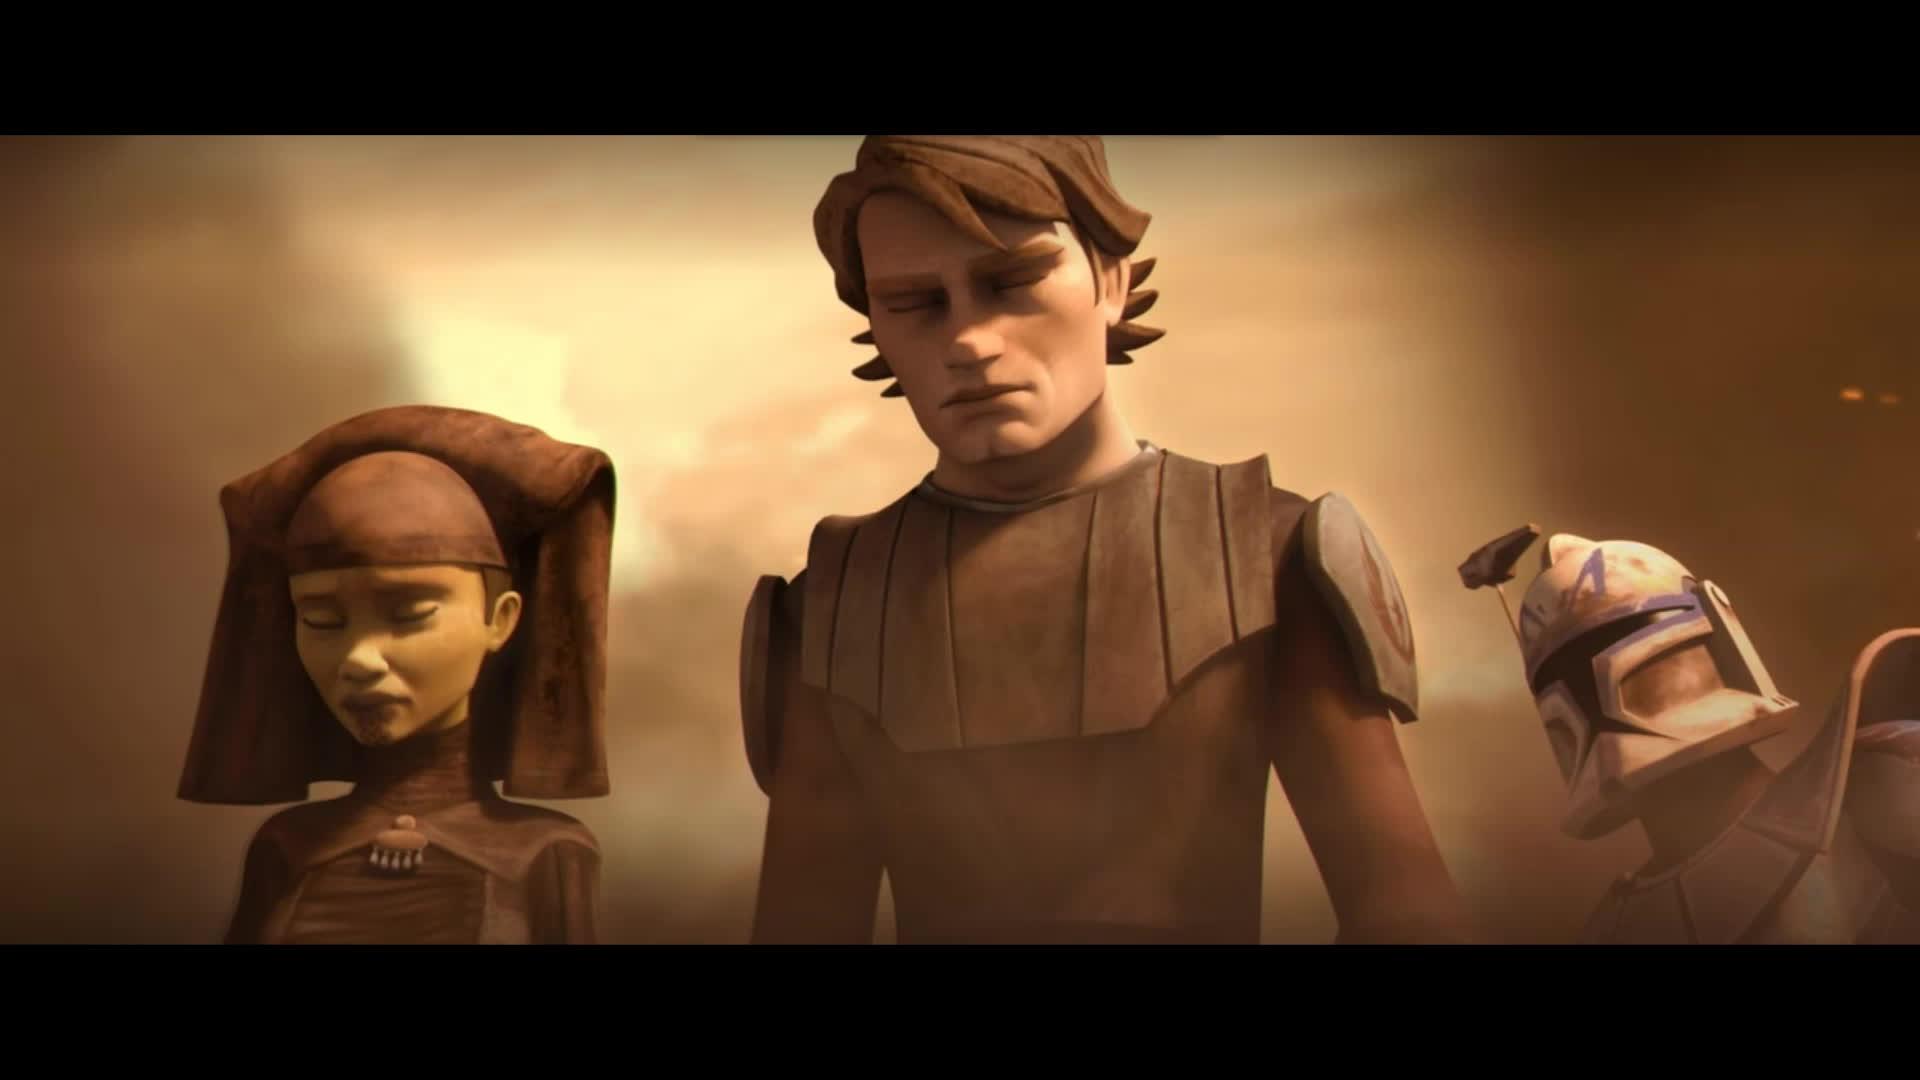 AskScienceFiction, The Ultimate Canon Anakin Skywalker Respect Thread (reddit) GIFs